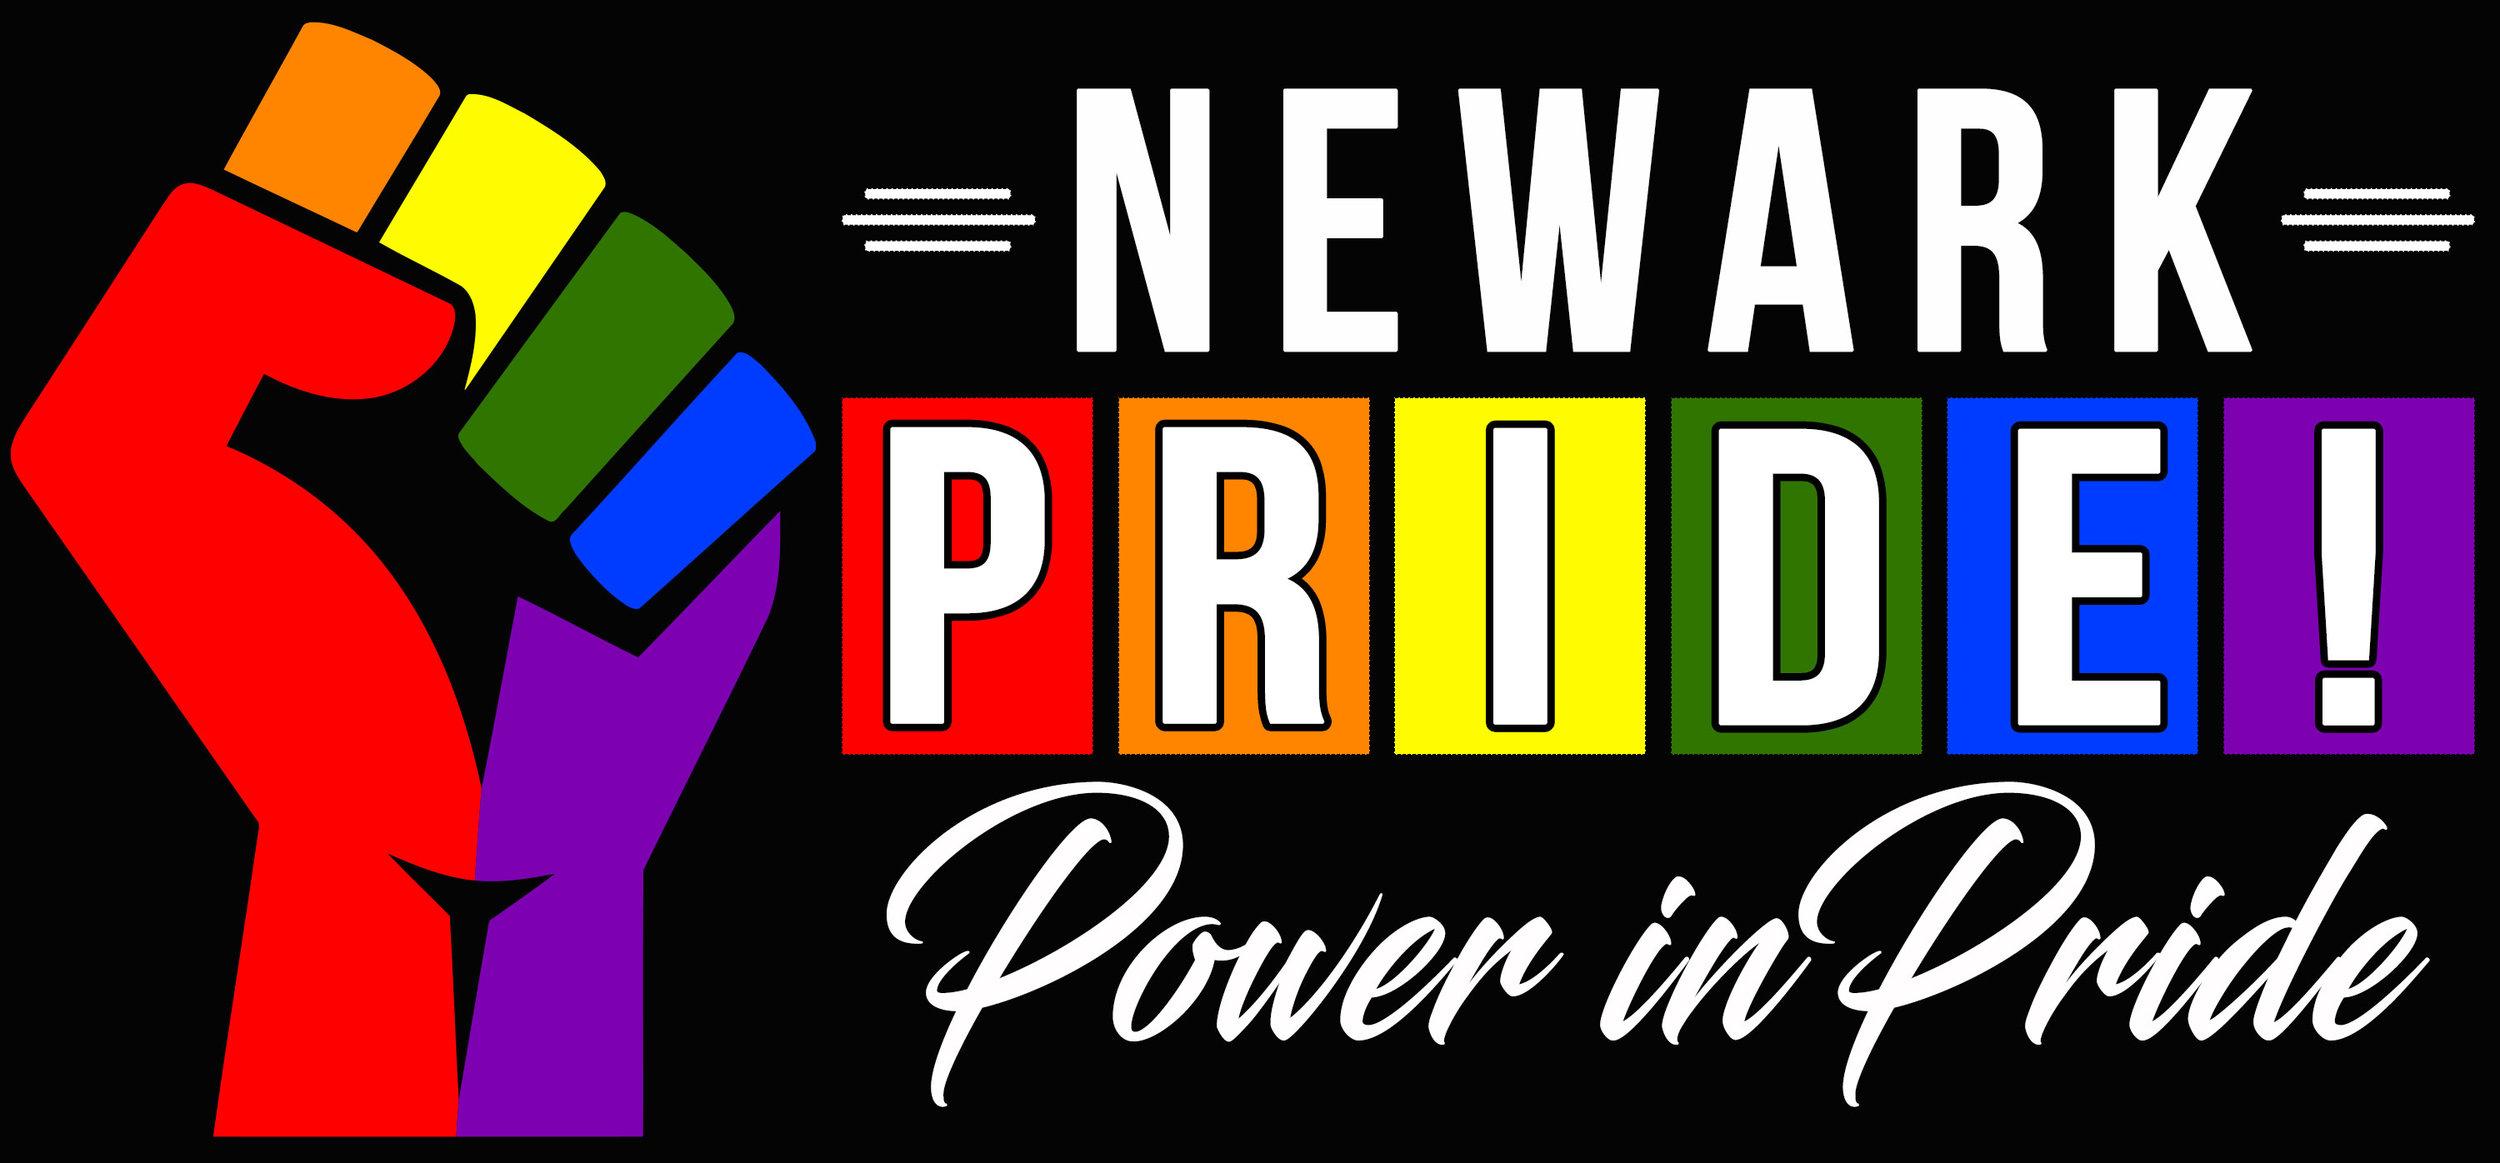 Newark Pride 2017